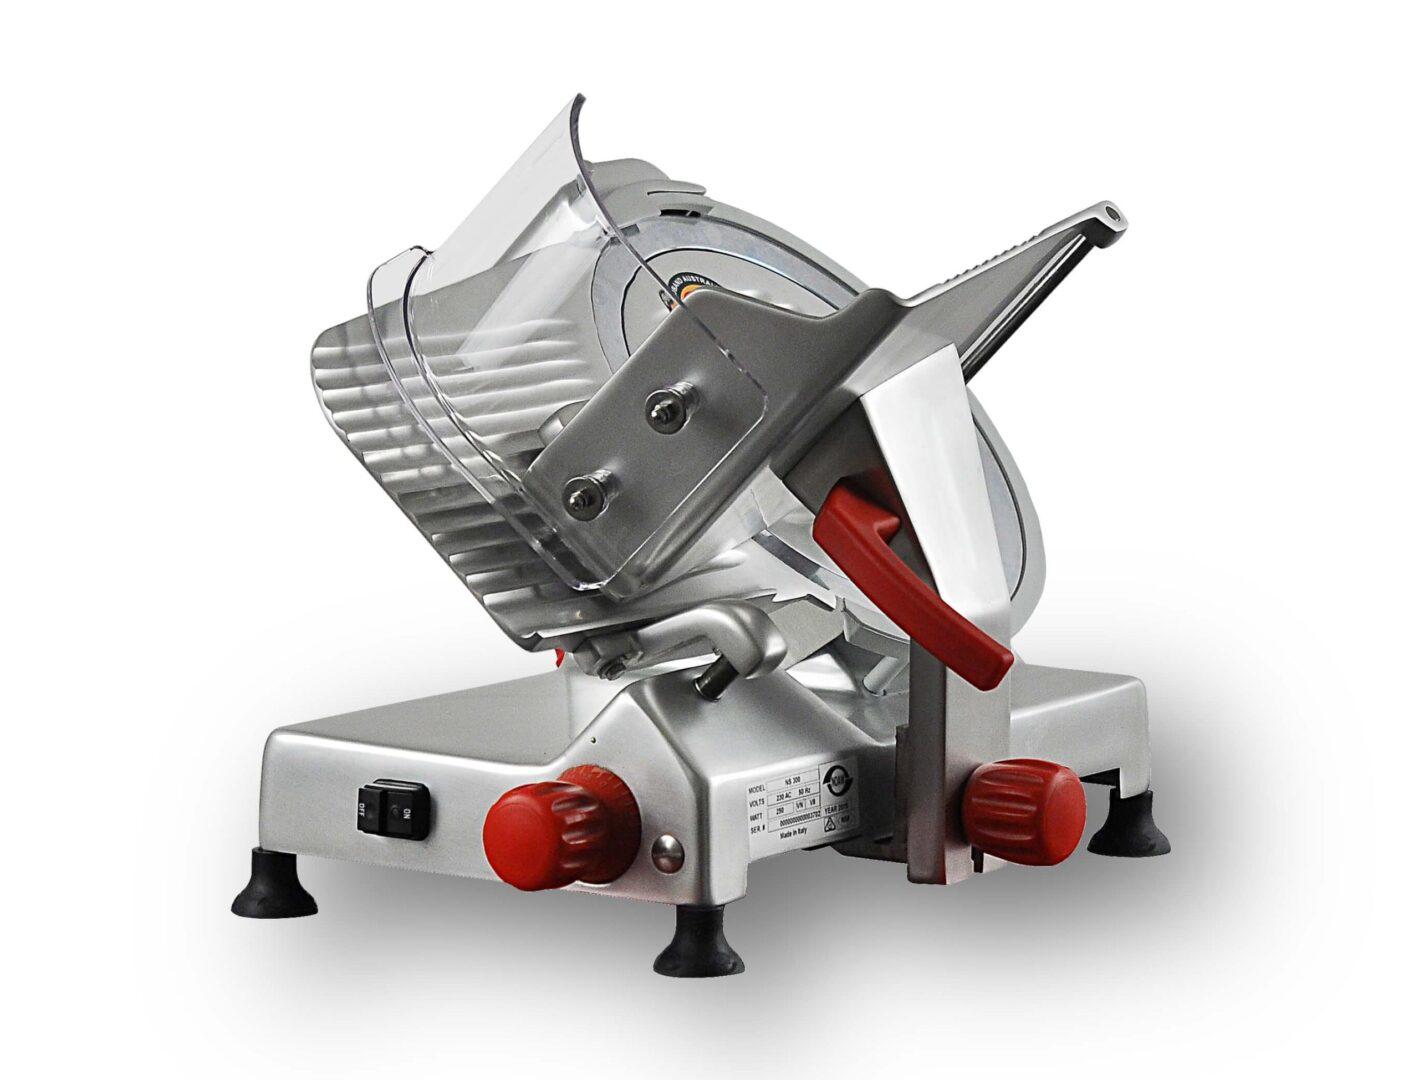 Noaw Manual Gravity Feed Slicers – Medium Duty, 300mm blade